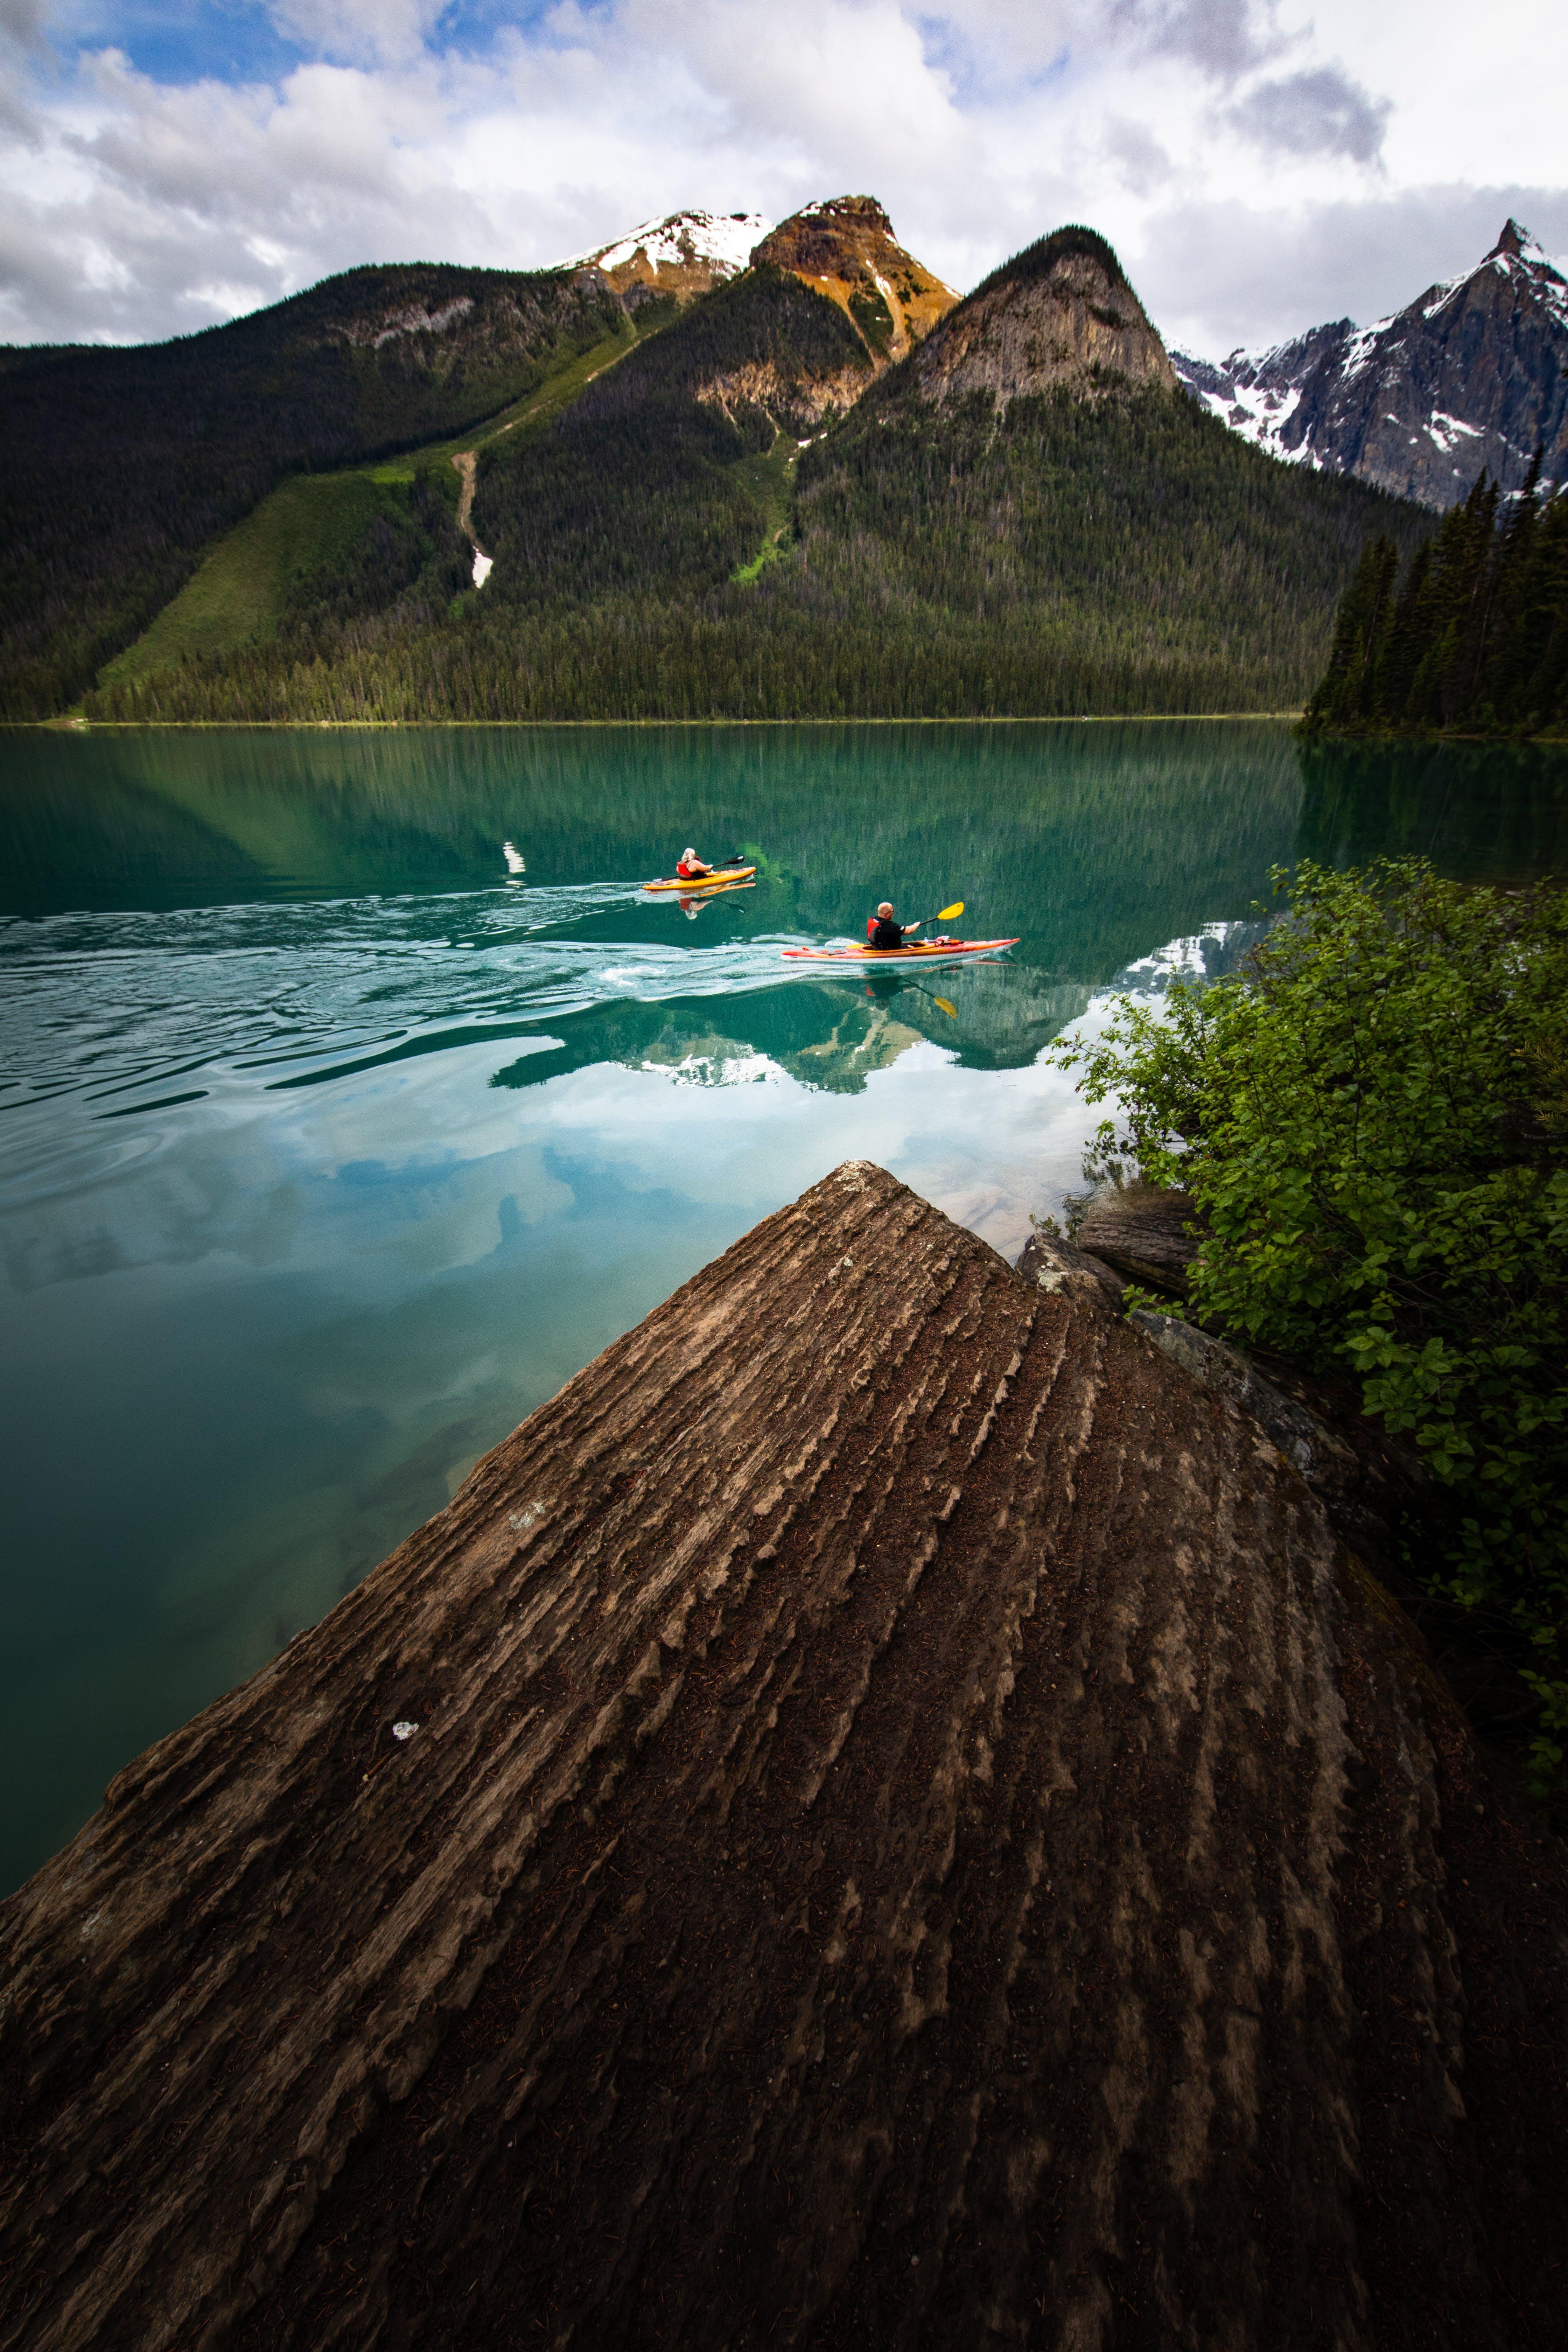 Group of People on Kayak